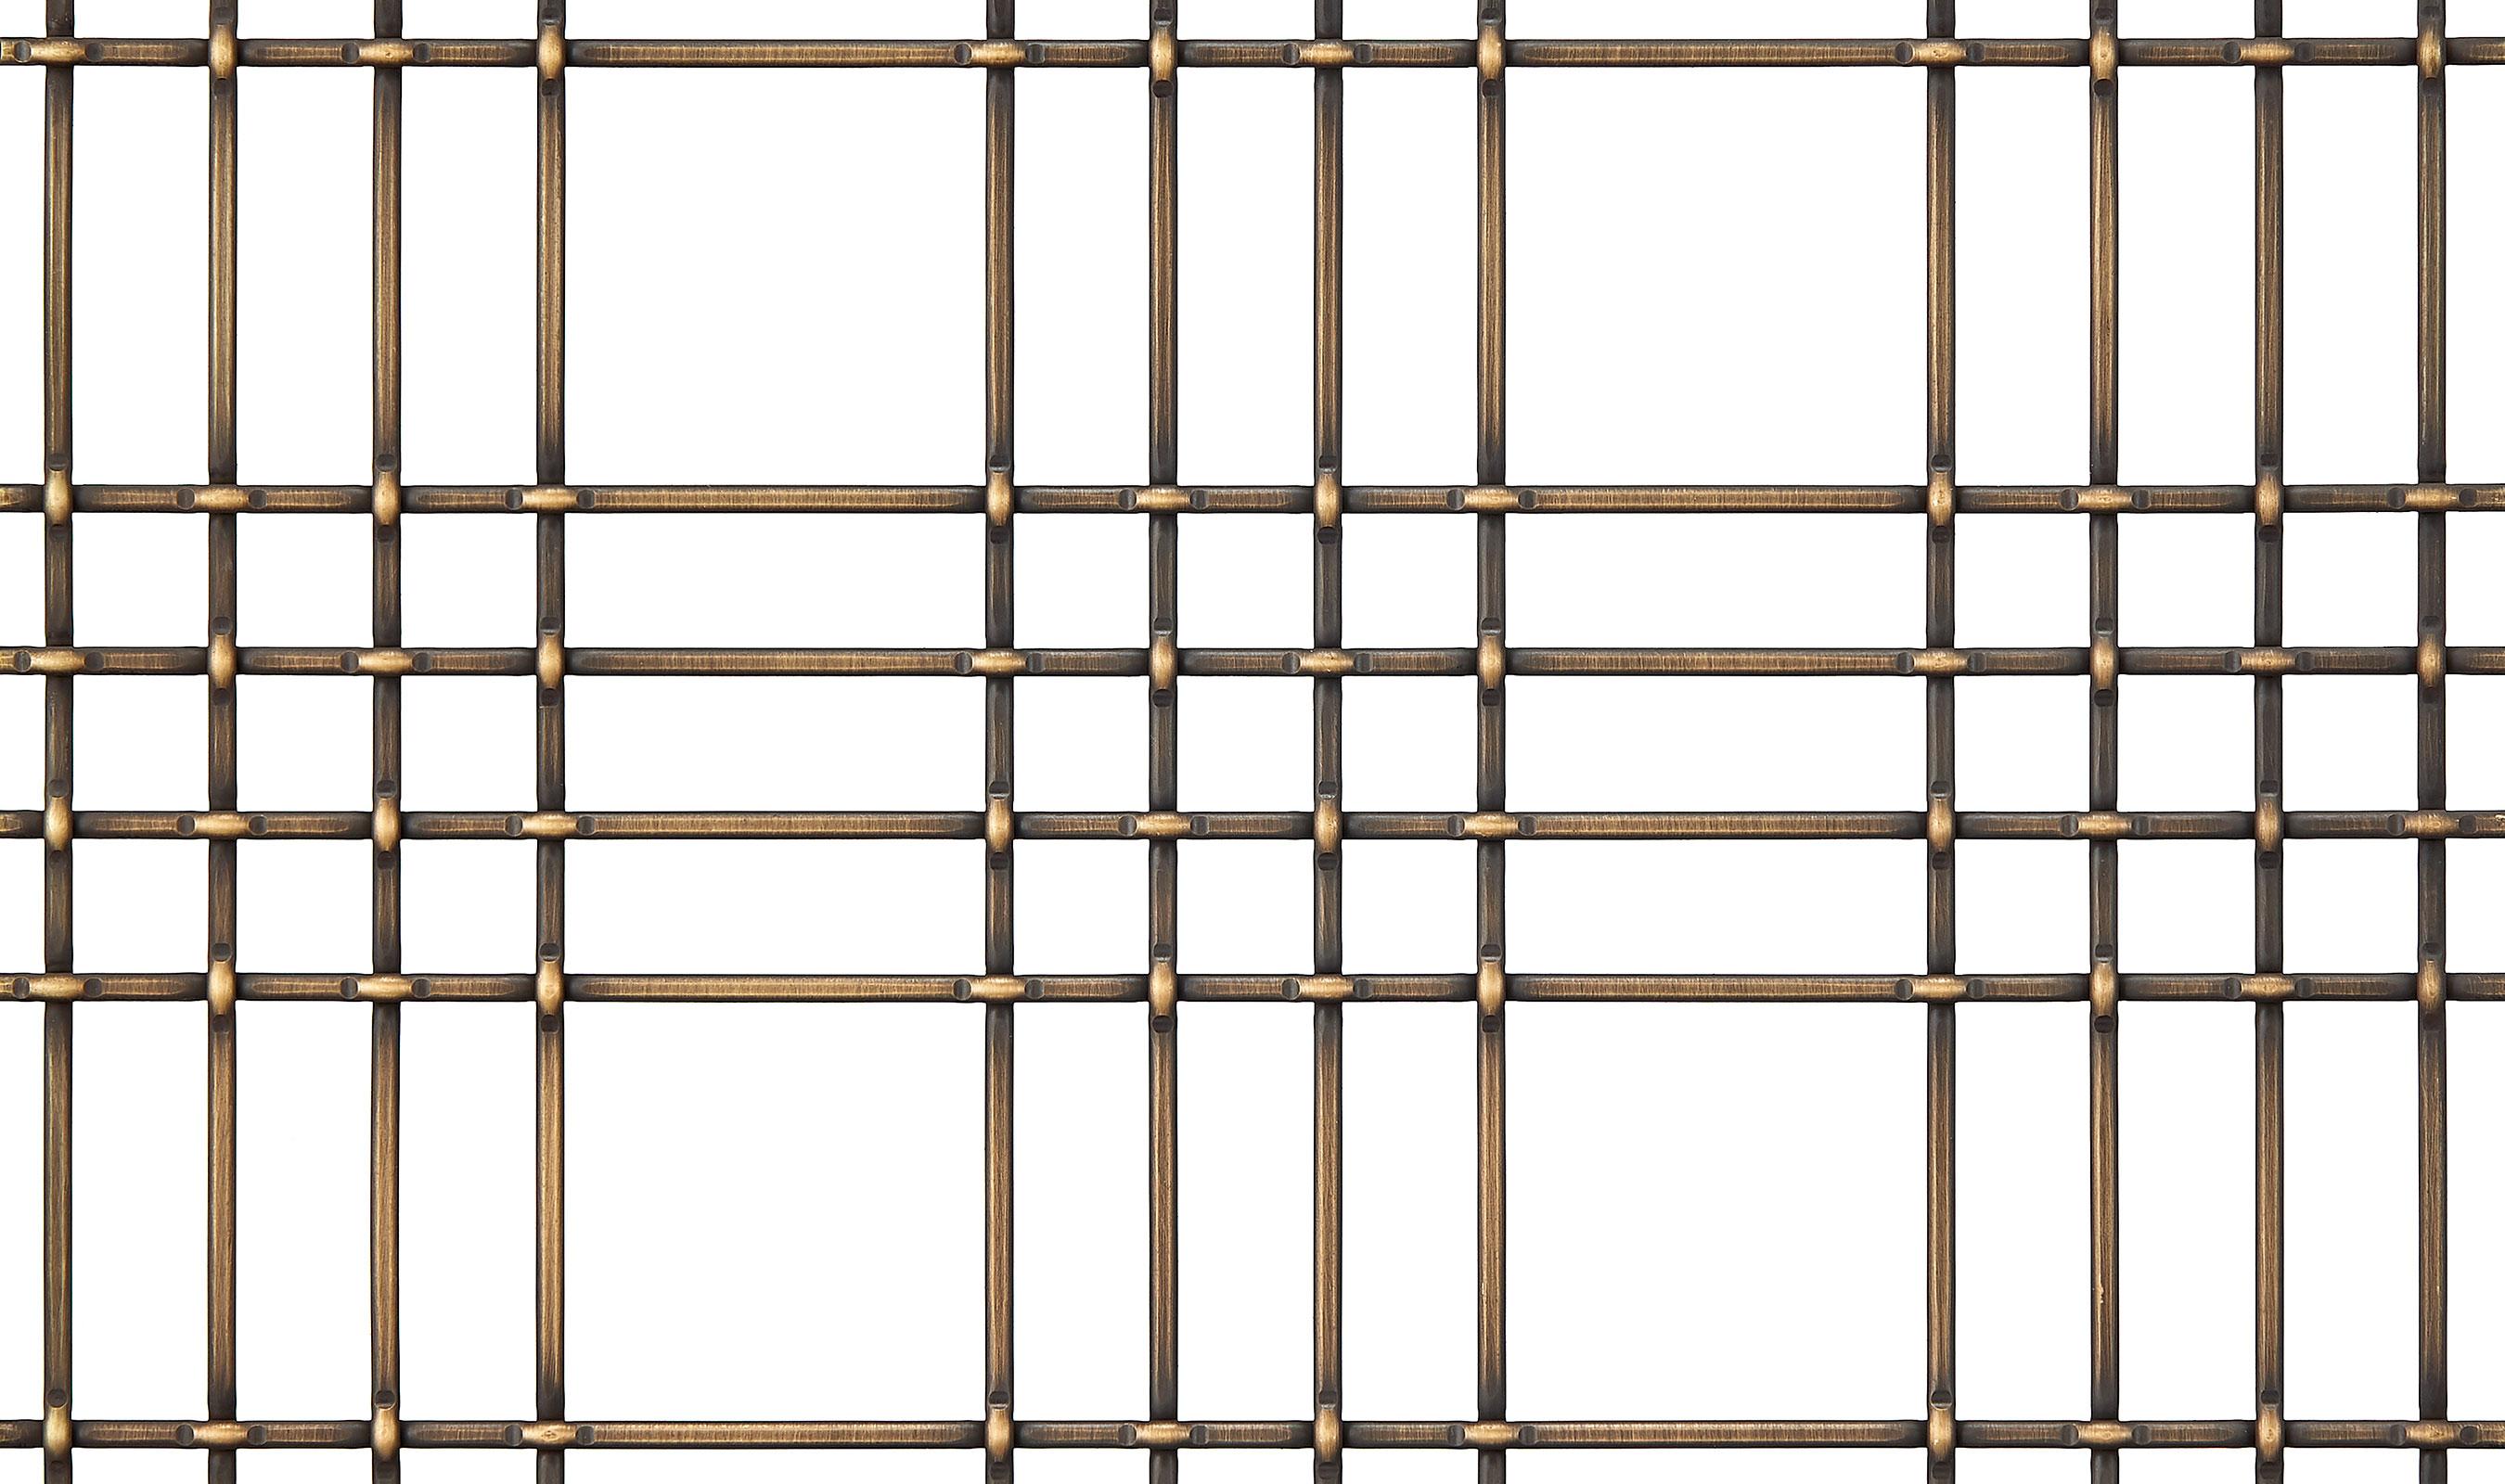 M44-2 Antique Brass Plated decorative wire mesh pattern